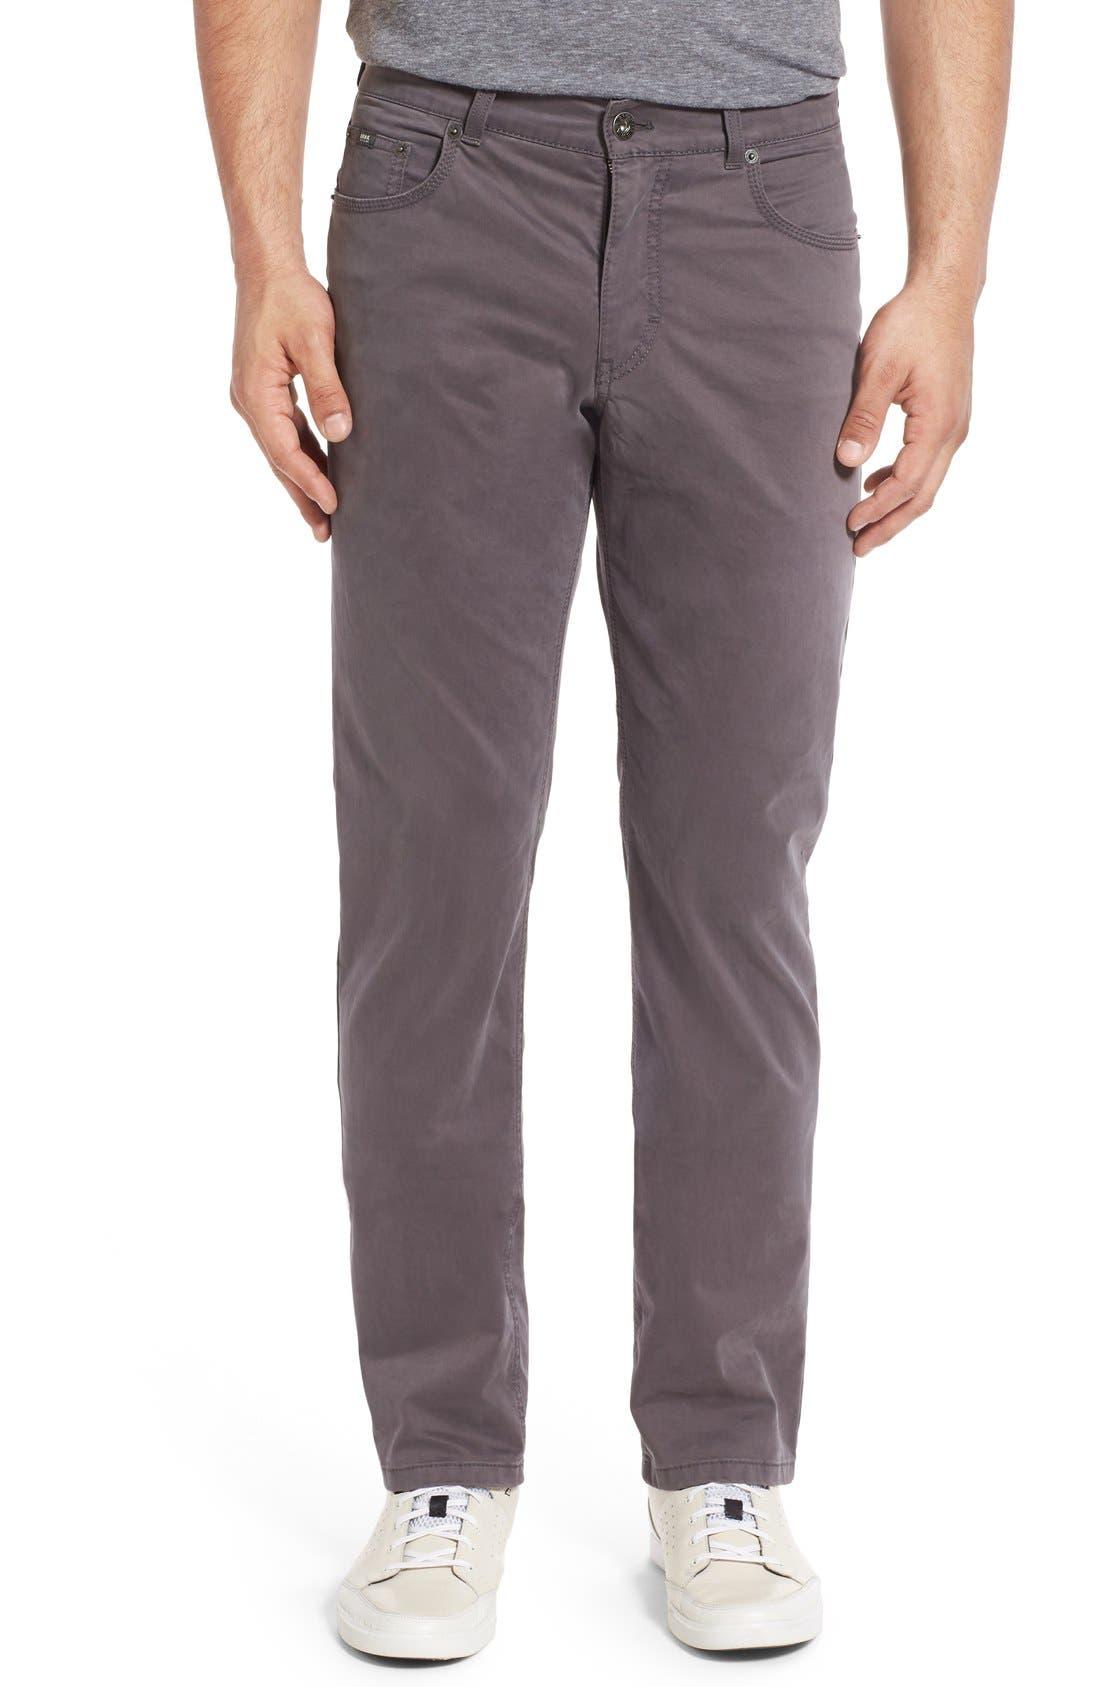 Brax Cooper Stretch Pima Cotton Pants